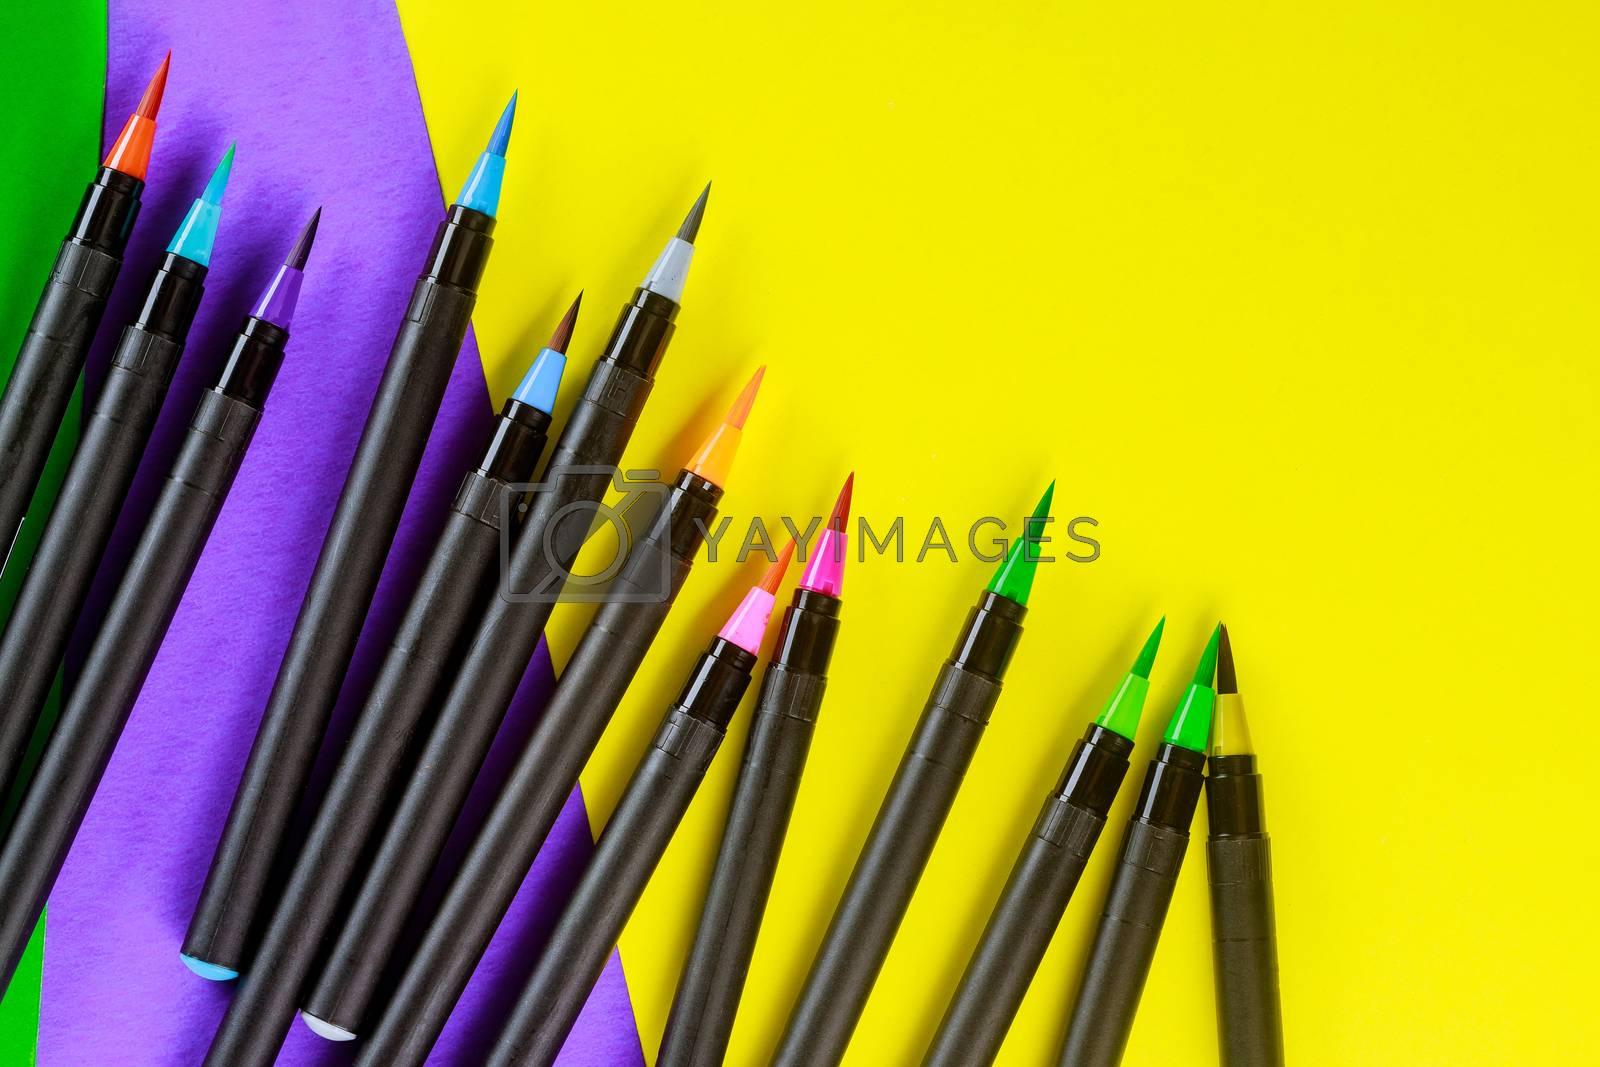 School supplies flexible watercolor brush pens for creativity